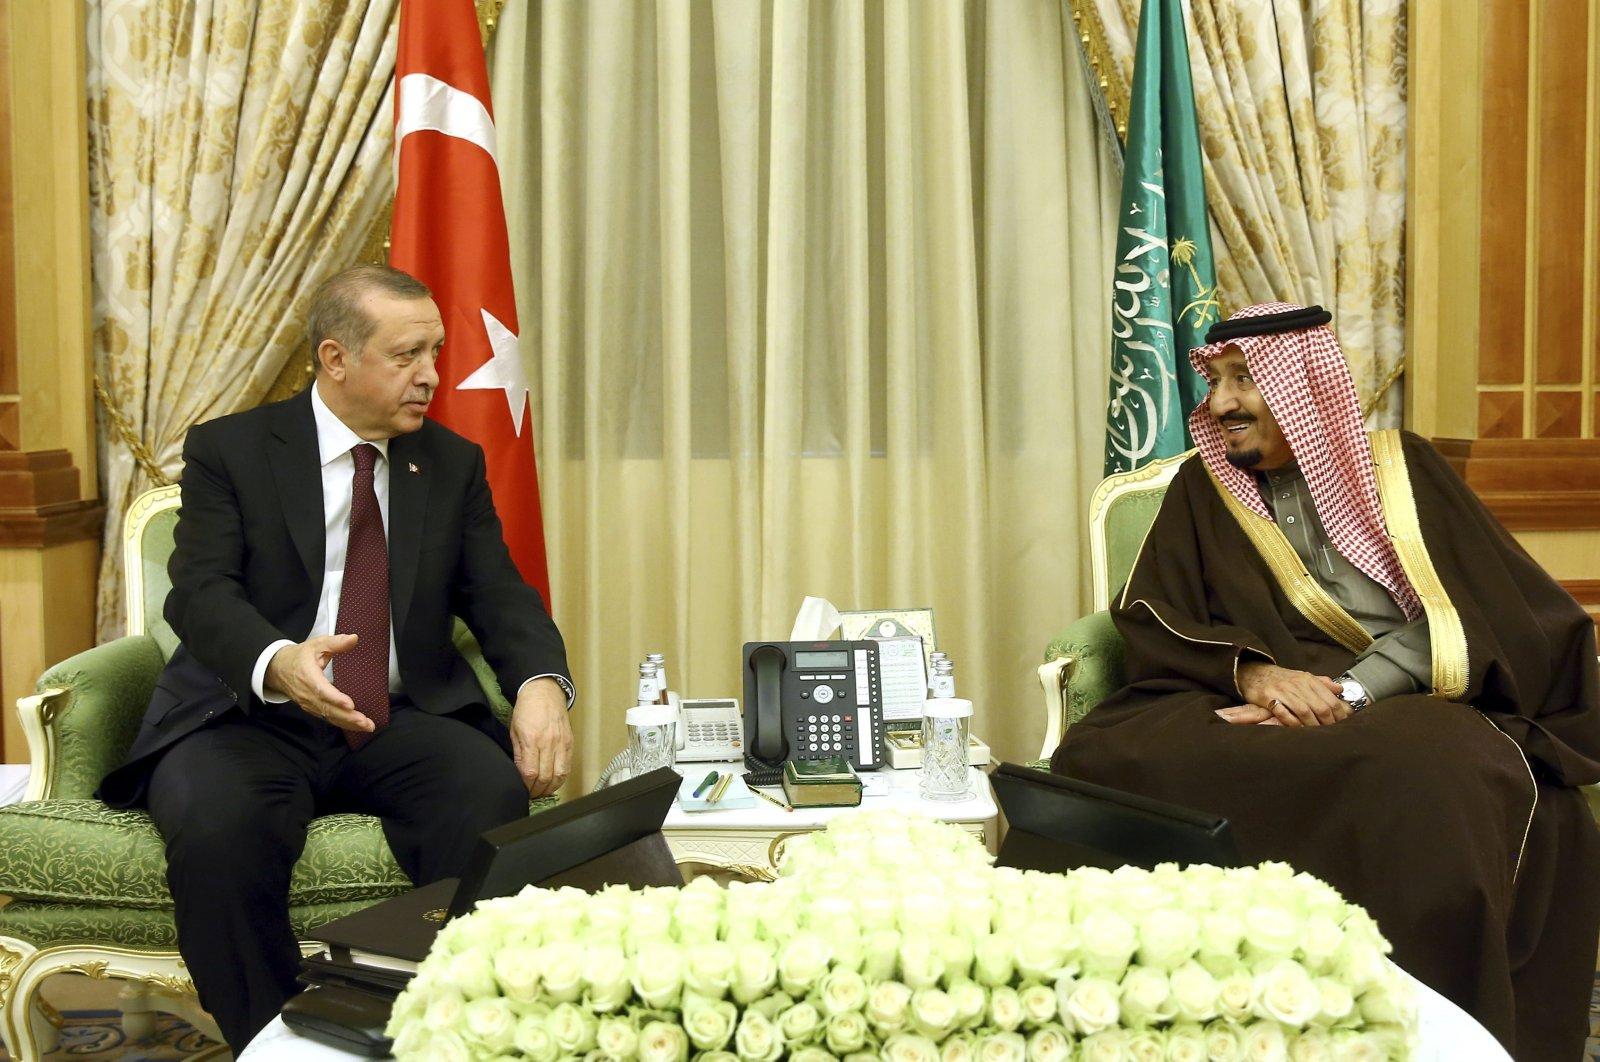 President Recep Tayyip Erdoğan meets with Saudi King Salman in Riyadh, Saudi Arabia, Feb. 14, 2017. (Reuters File Photo)